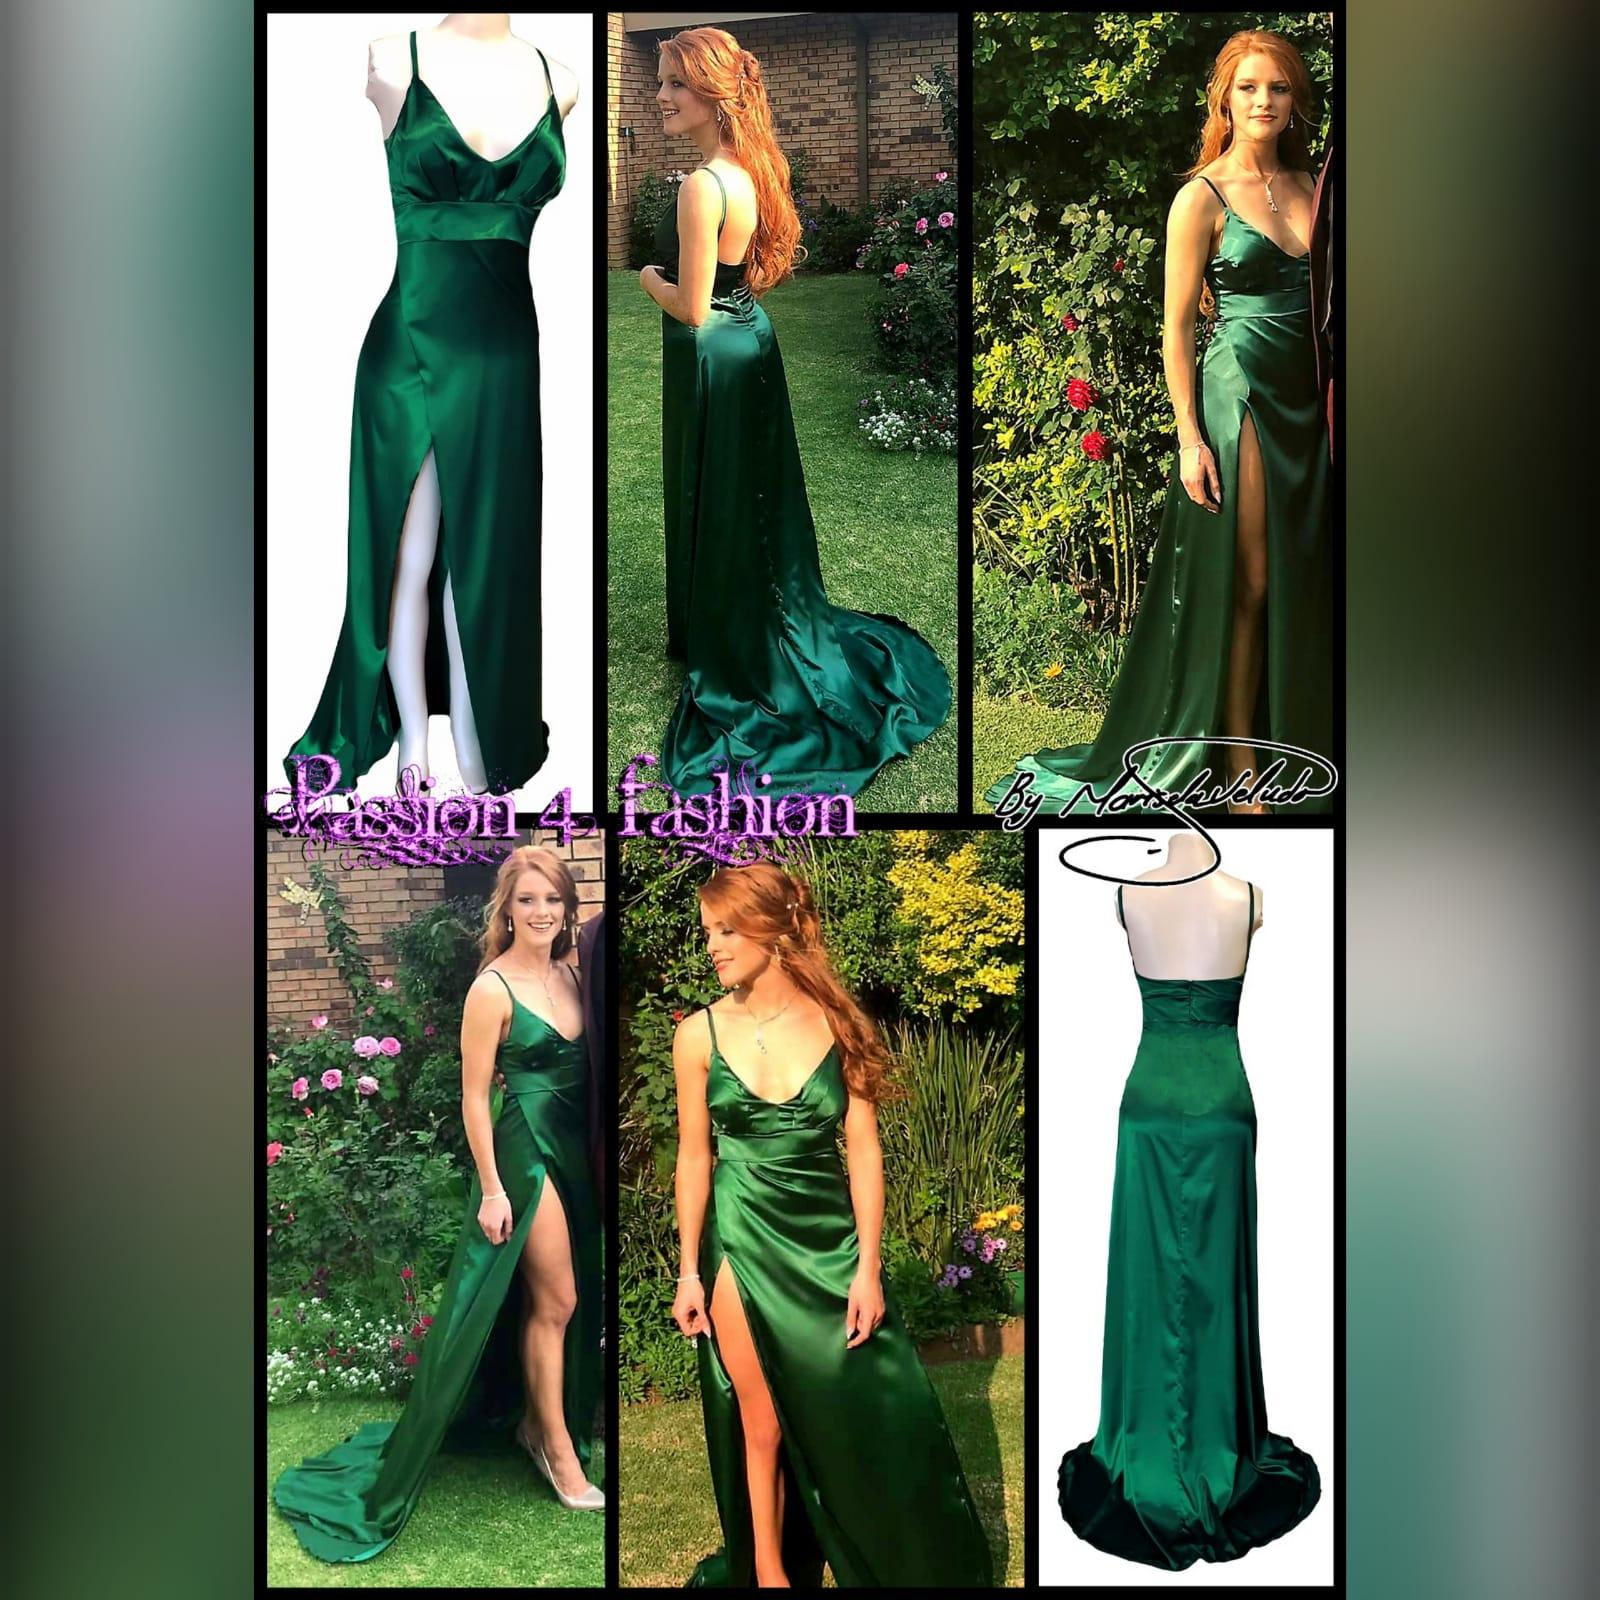 Emerald green long satin prom dress 6 emerald green long satin prom dress. With a high crossed slit and a train.